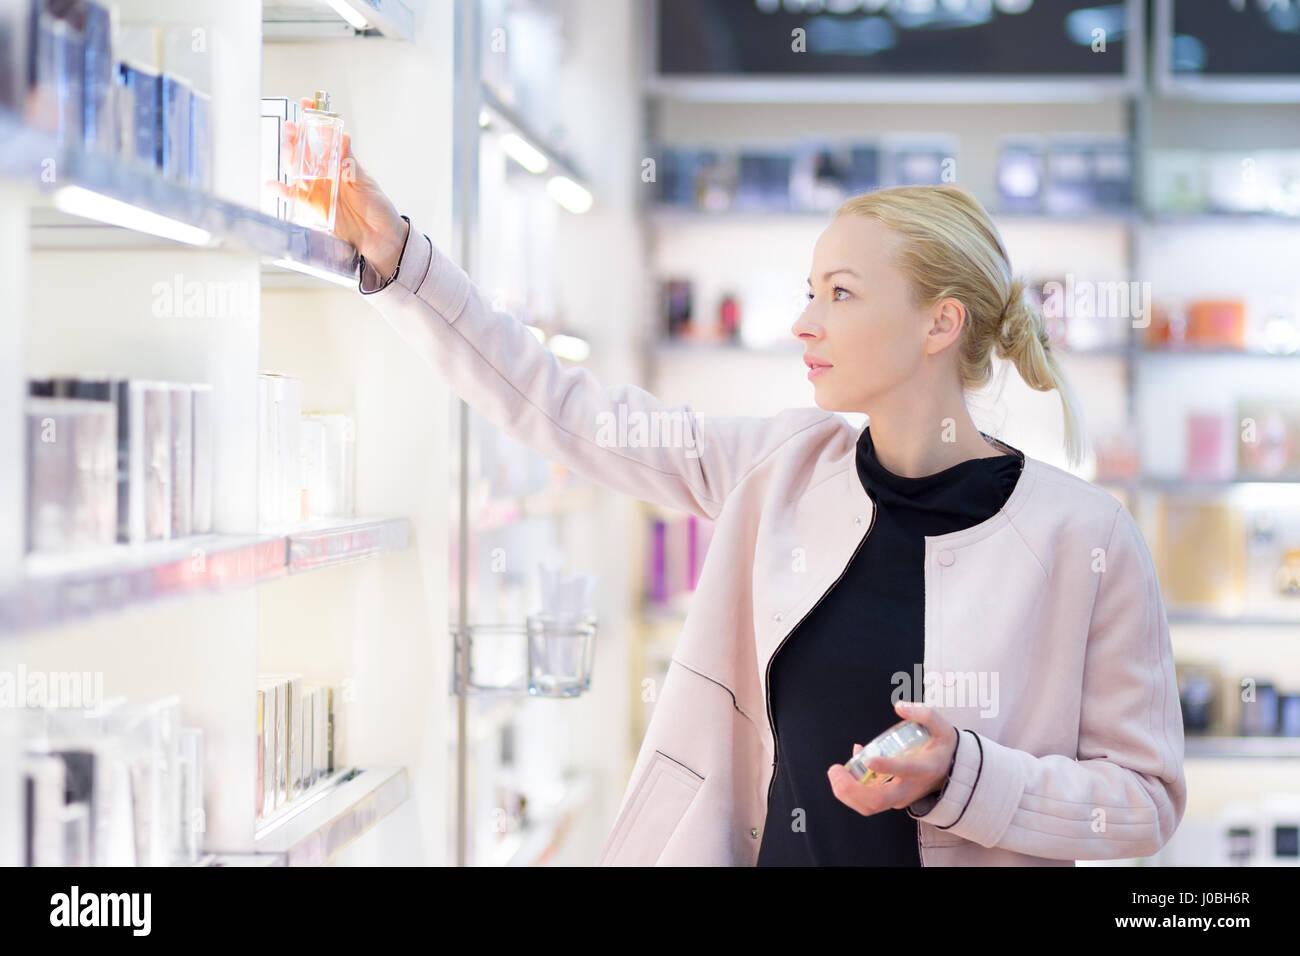 Schöne Frau im Beauty Shop einkaufen. Stockbild